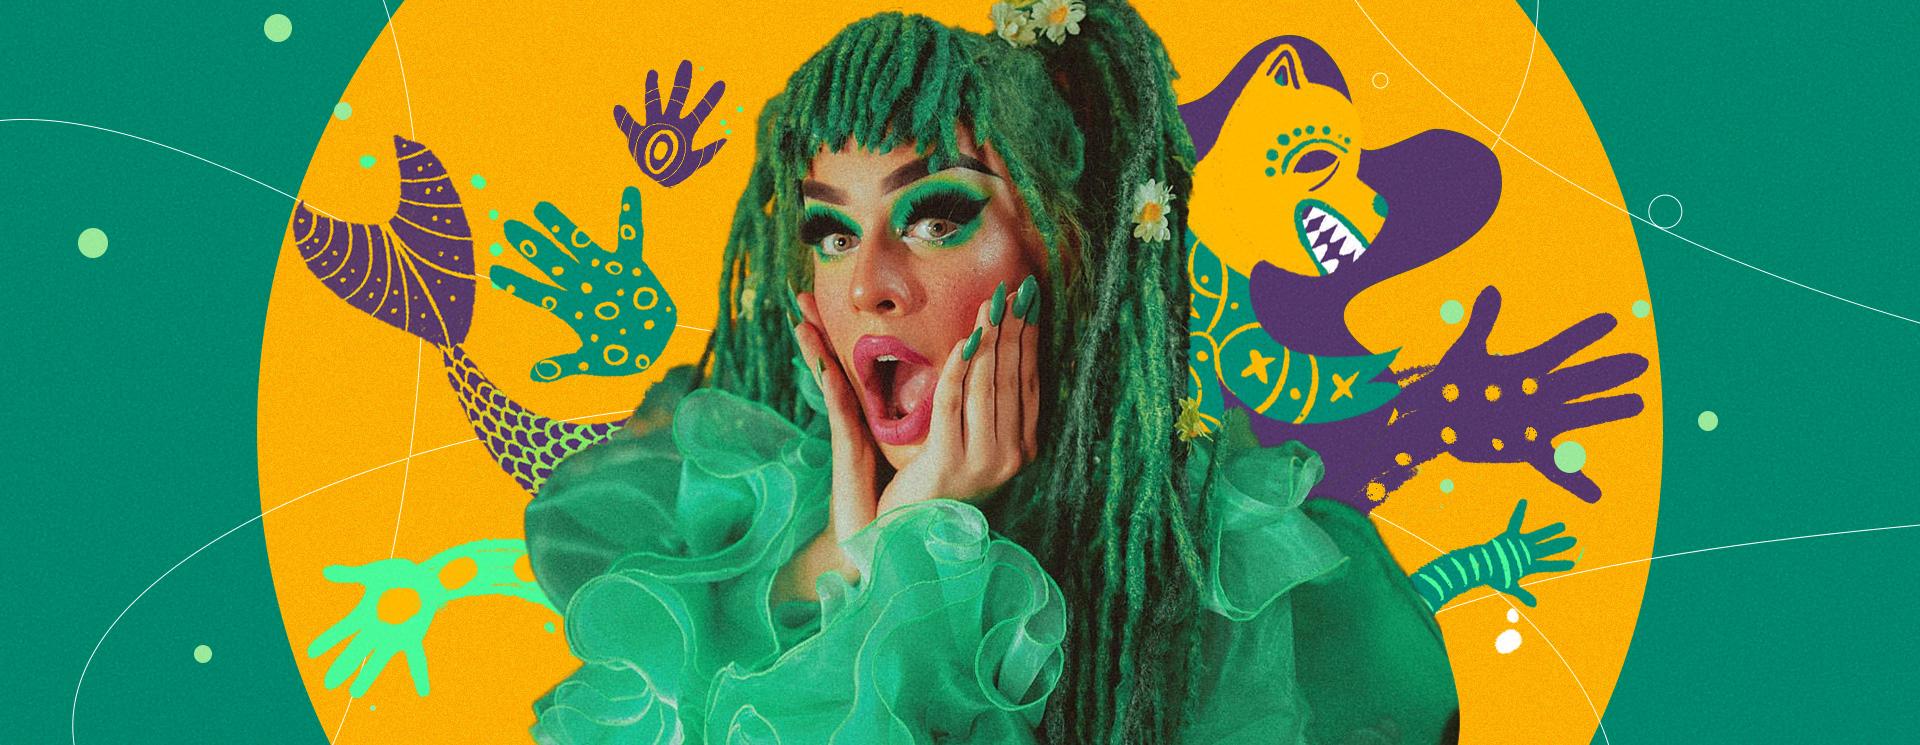 BLOCOS LGBTQ CARNAVAL BRASILIA